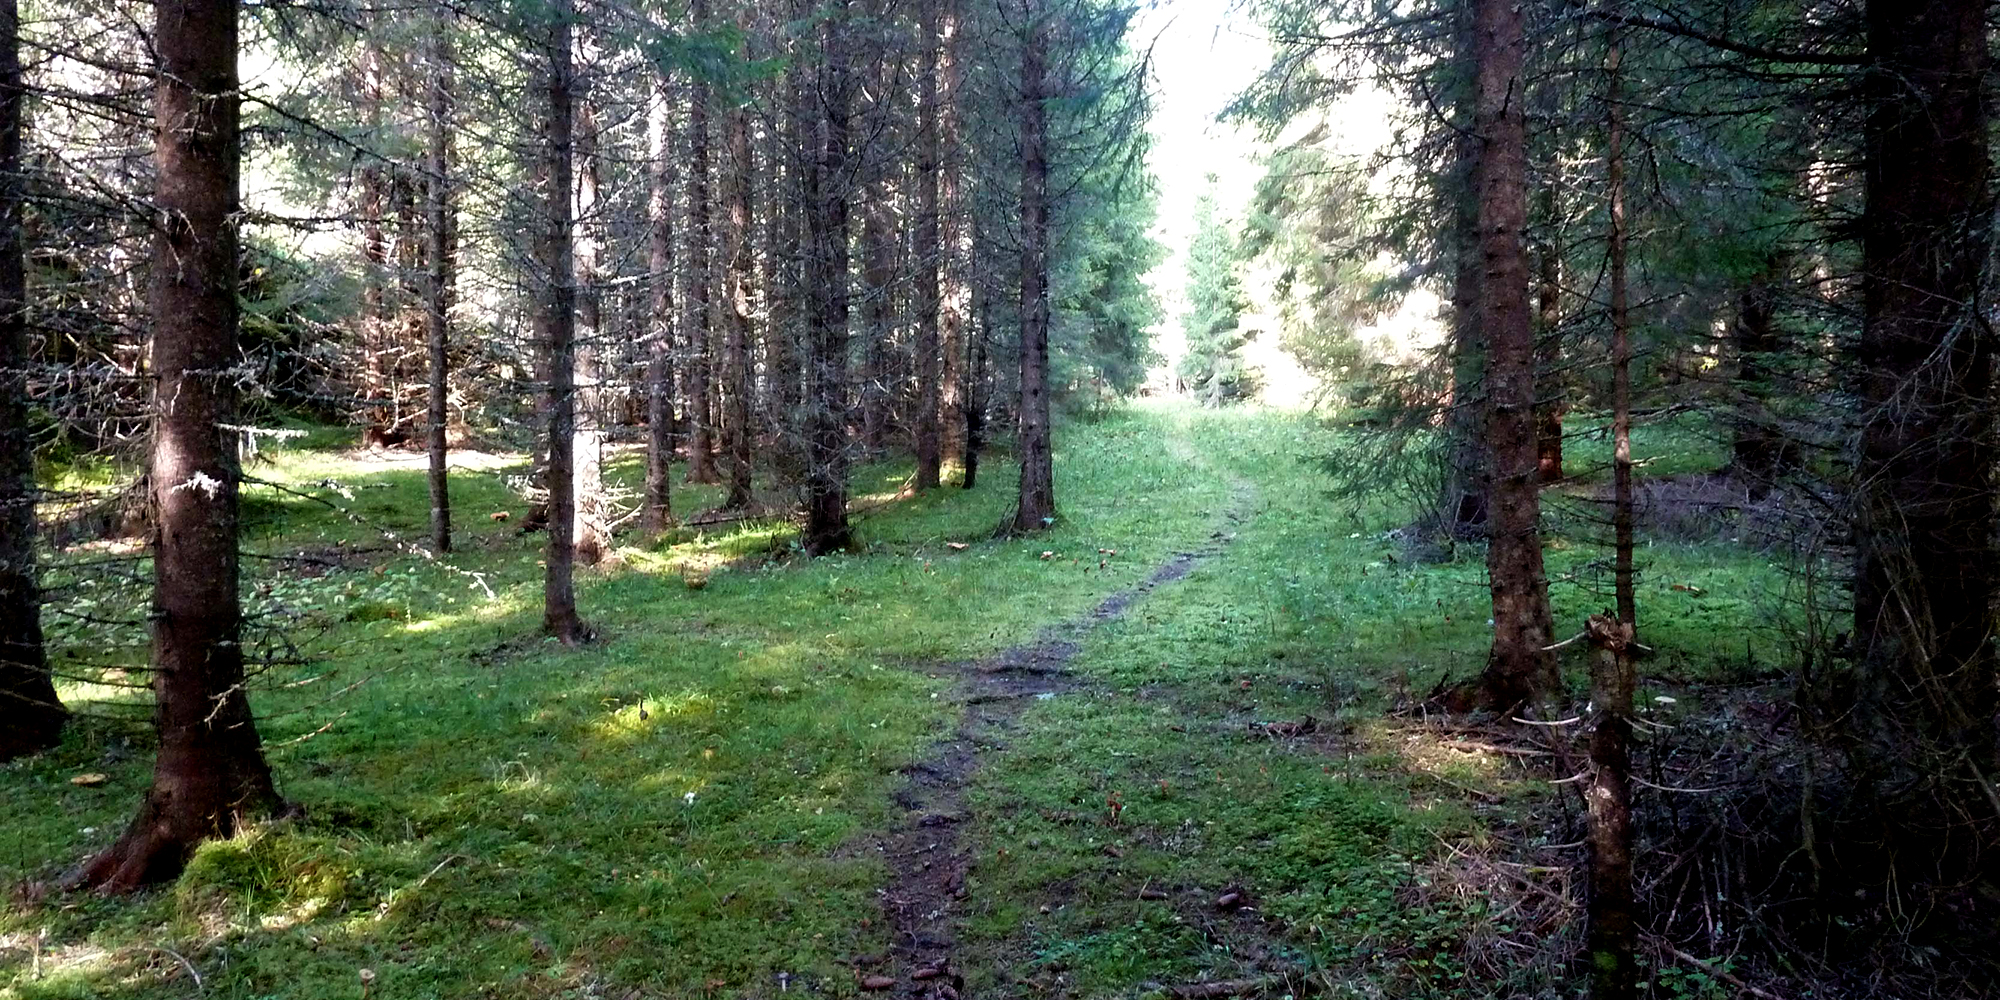 Fargetuva - sti i skogen. Copyright: Fargetuva